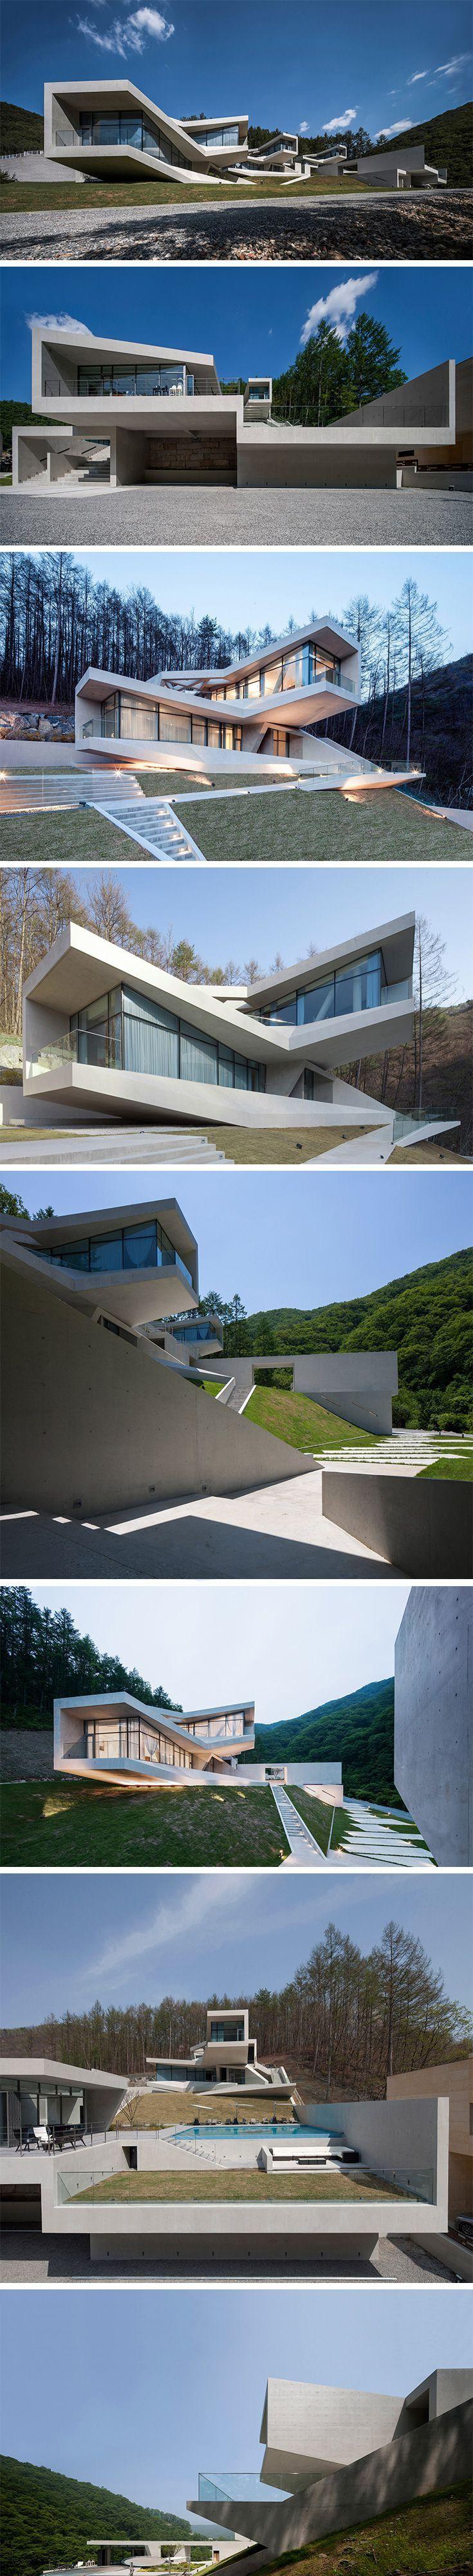 U Retreat by studio IDMM Architects.(Need To Try Design Studios)